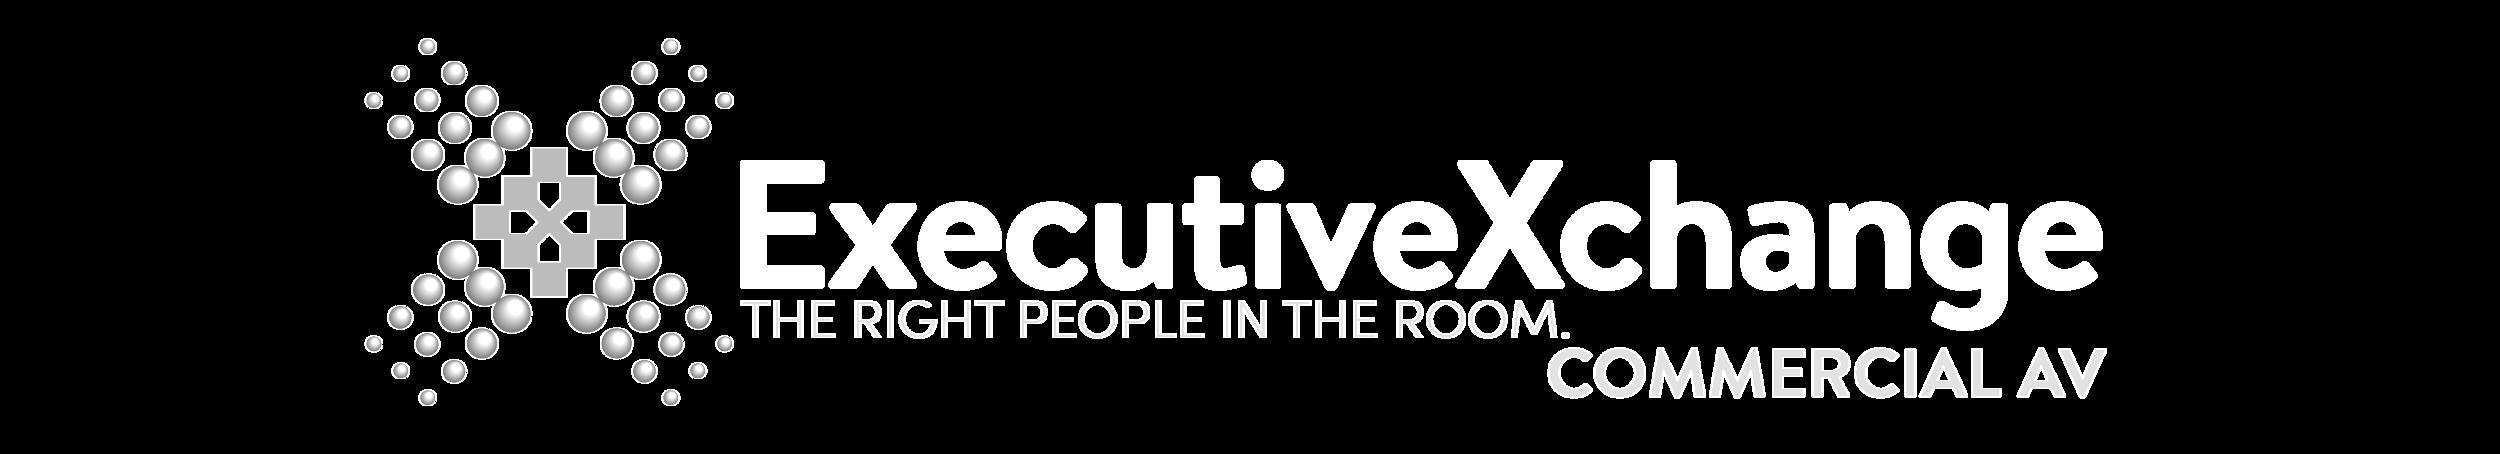 ExecutiveXchange Commercial AV _ White.png